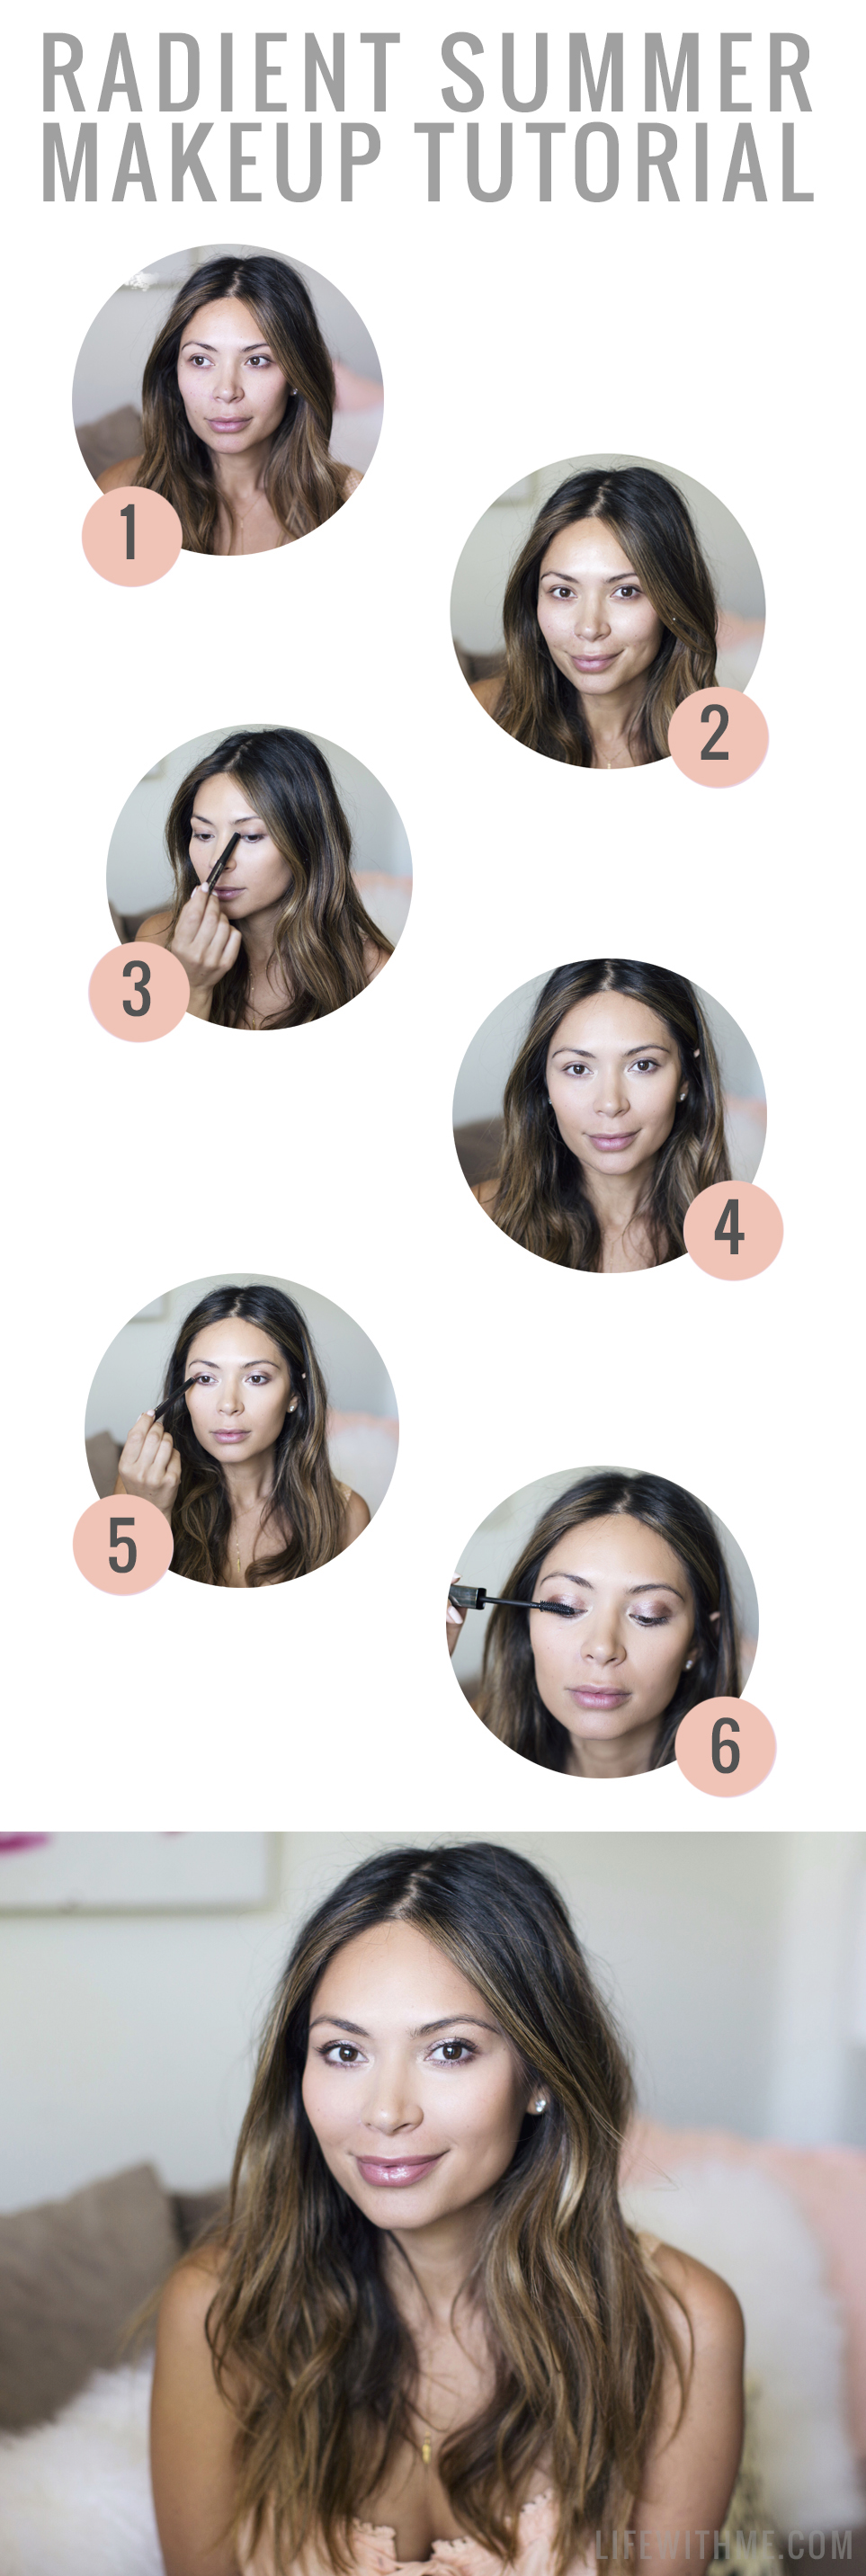 marianna hewitt makeup tutorial laura mercier radience primer pinterest how to